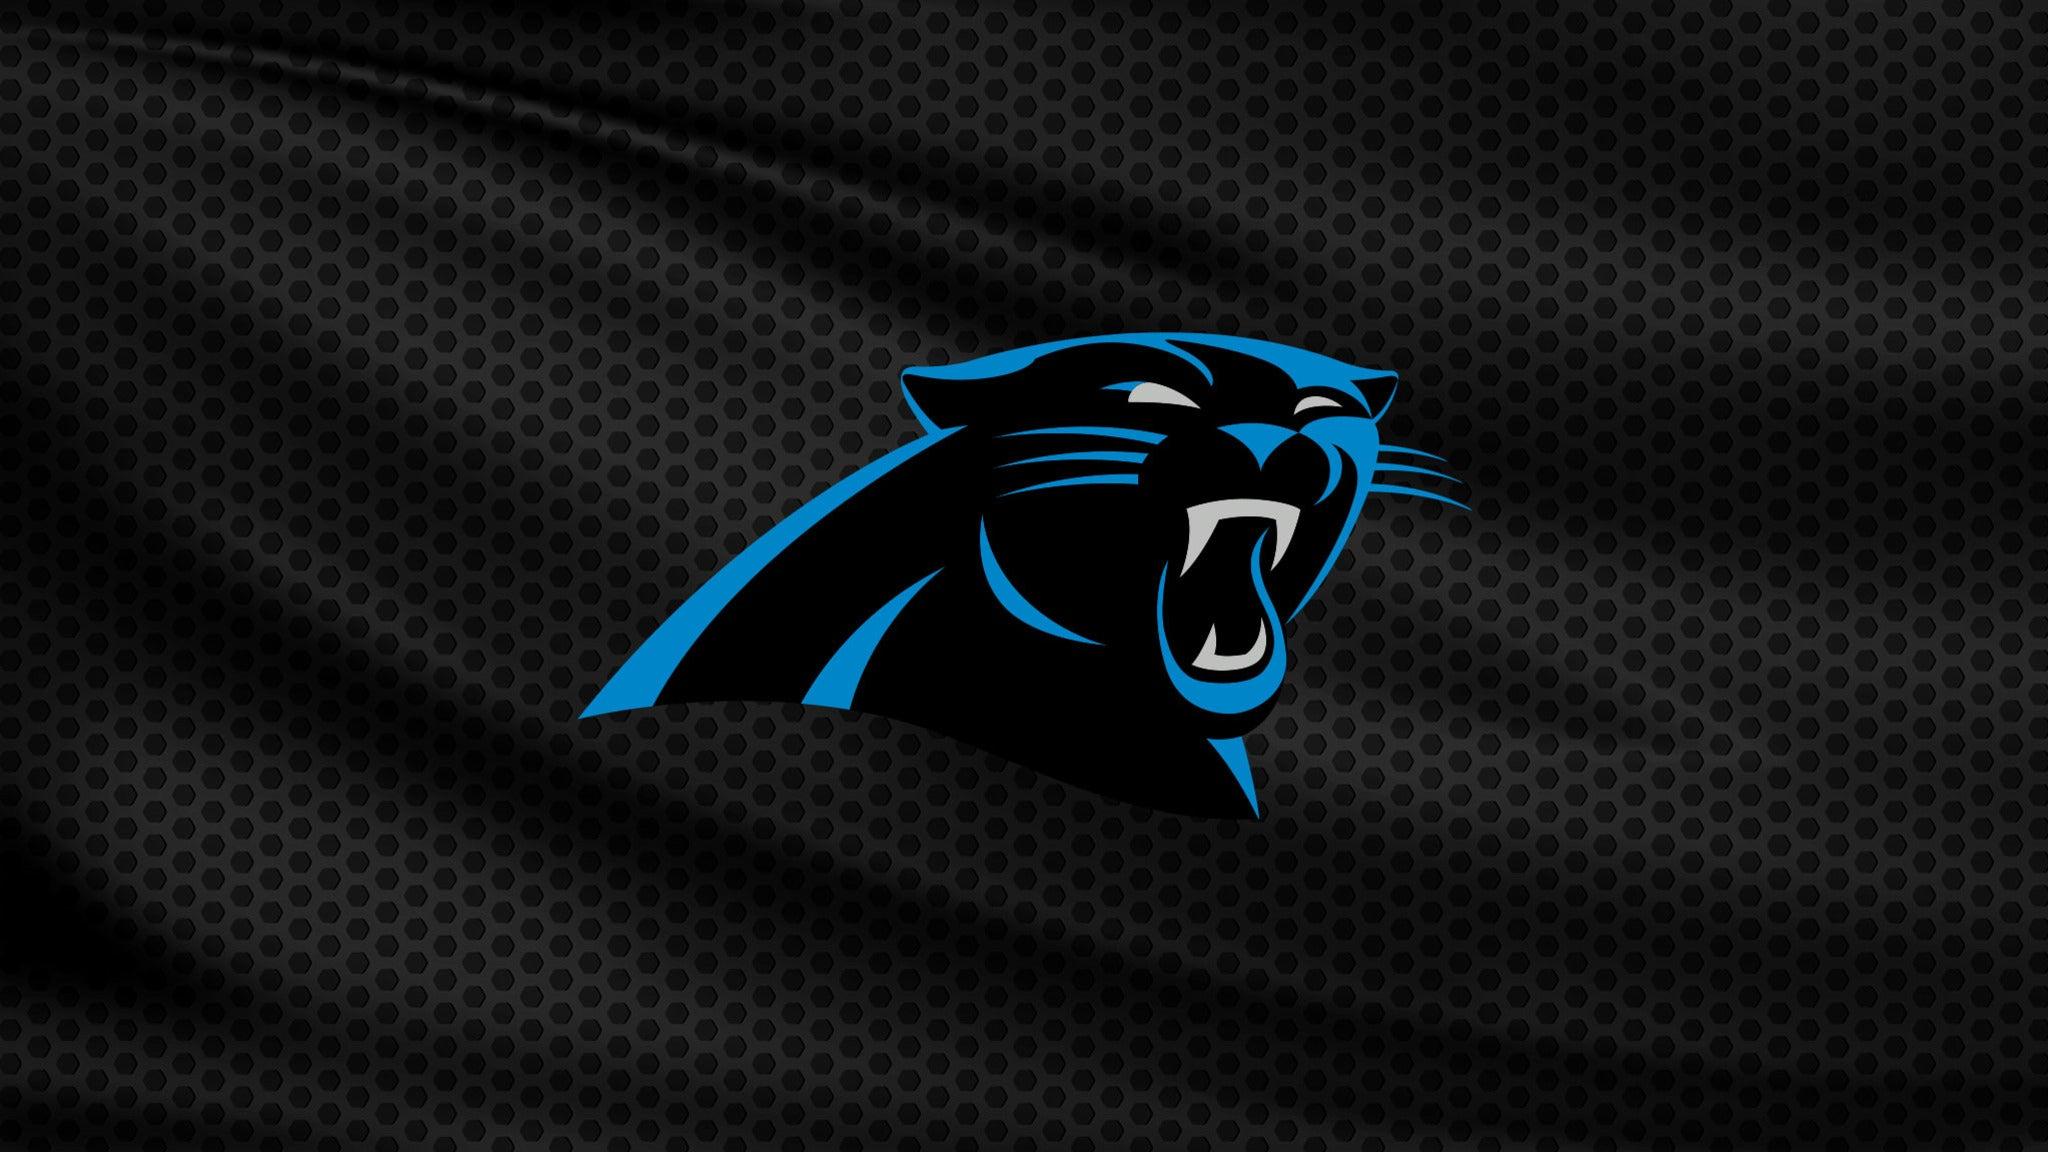 Carolina Panthers vs. Denver Broncos